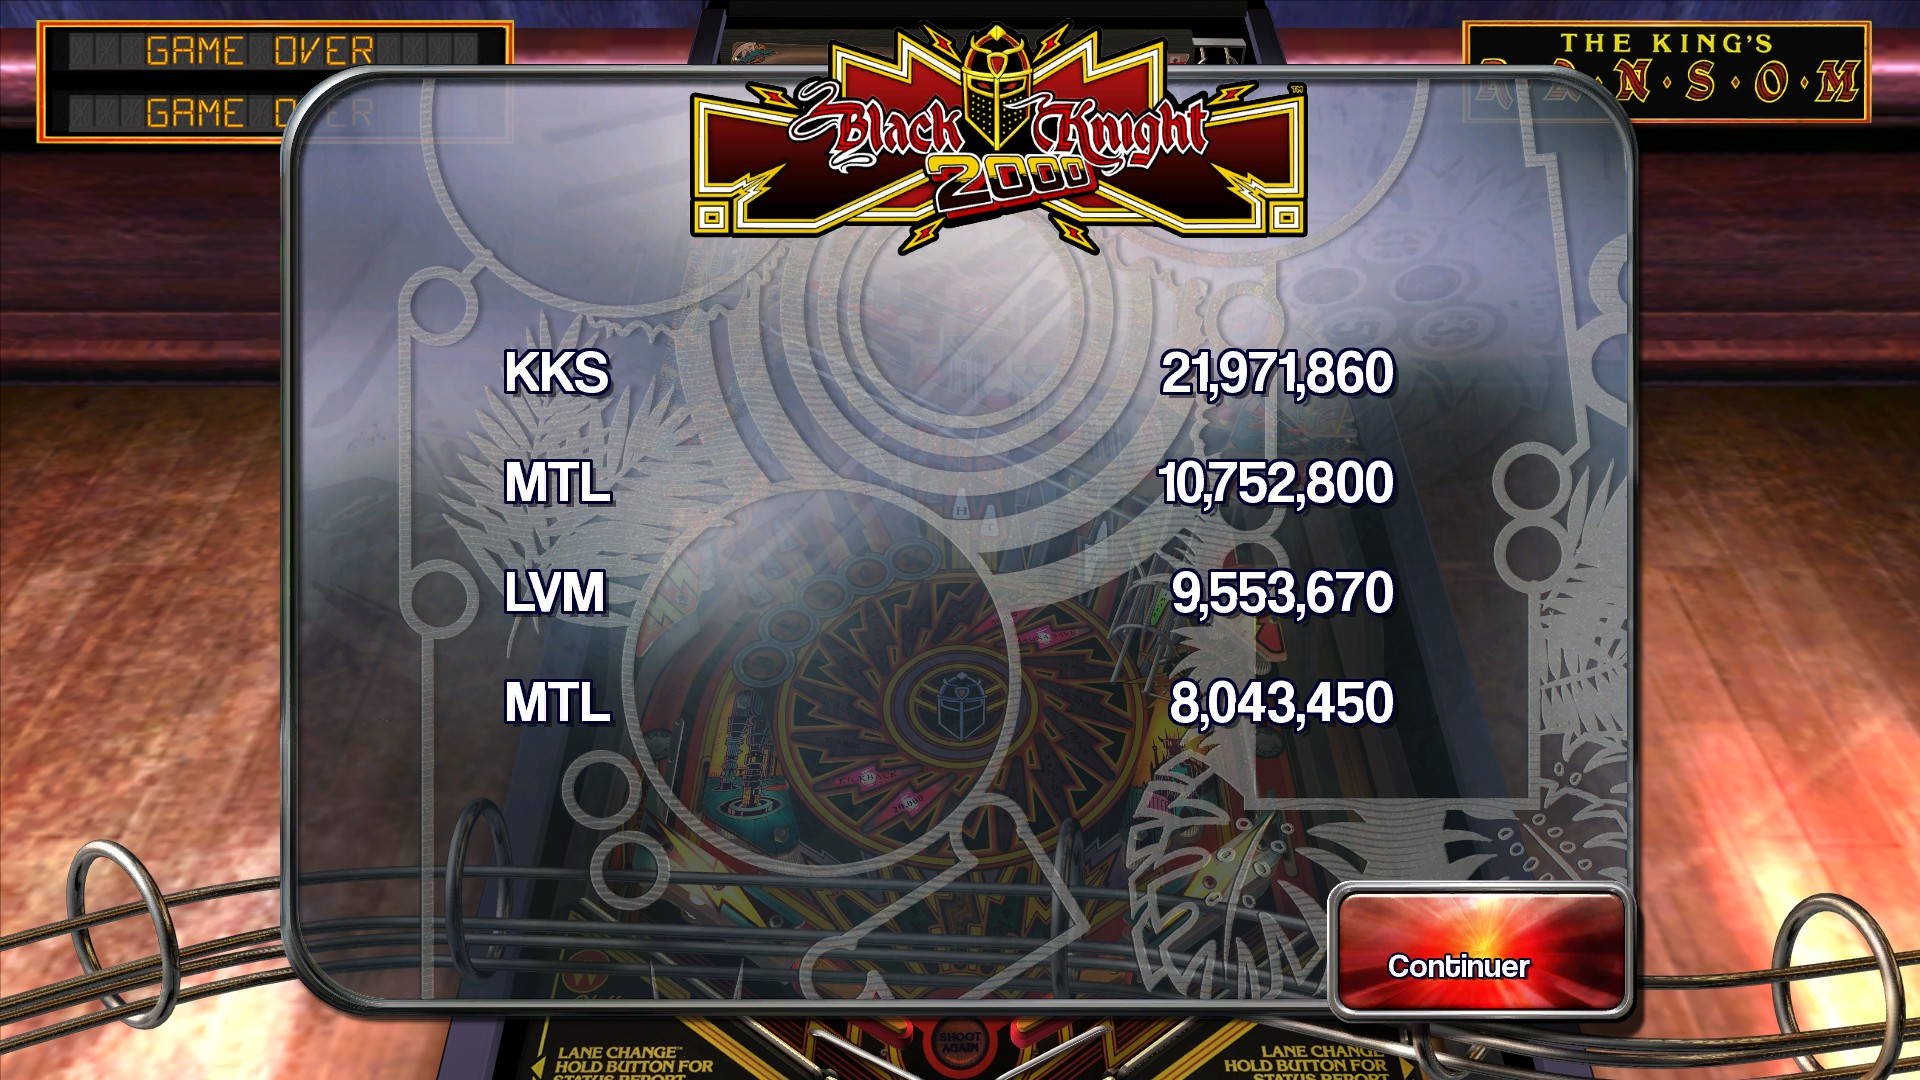 Mantalow: Pinball Arcade: Black Knight 2000 (PC) 10,752,800 points on 2016-02-25 10:21:08